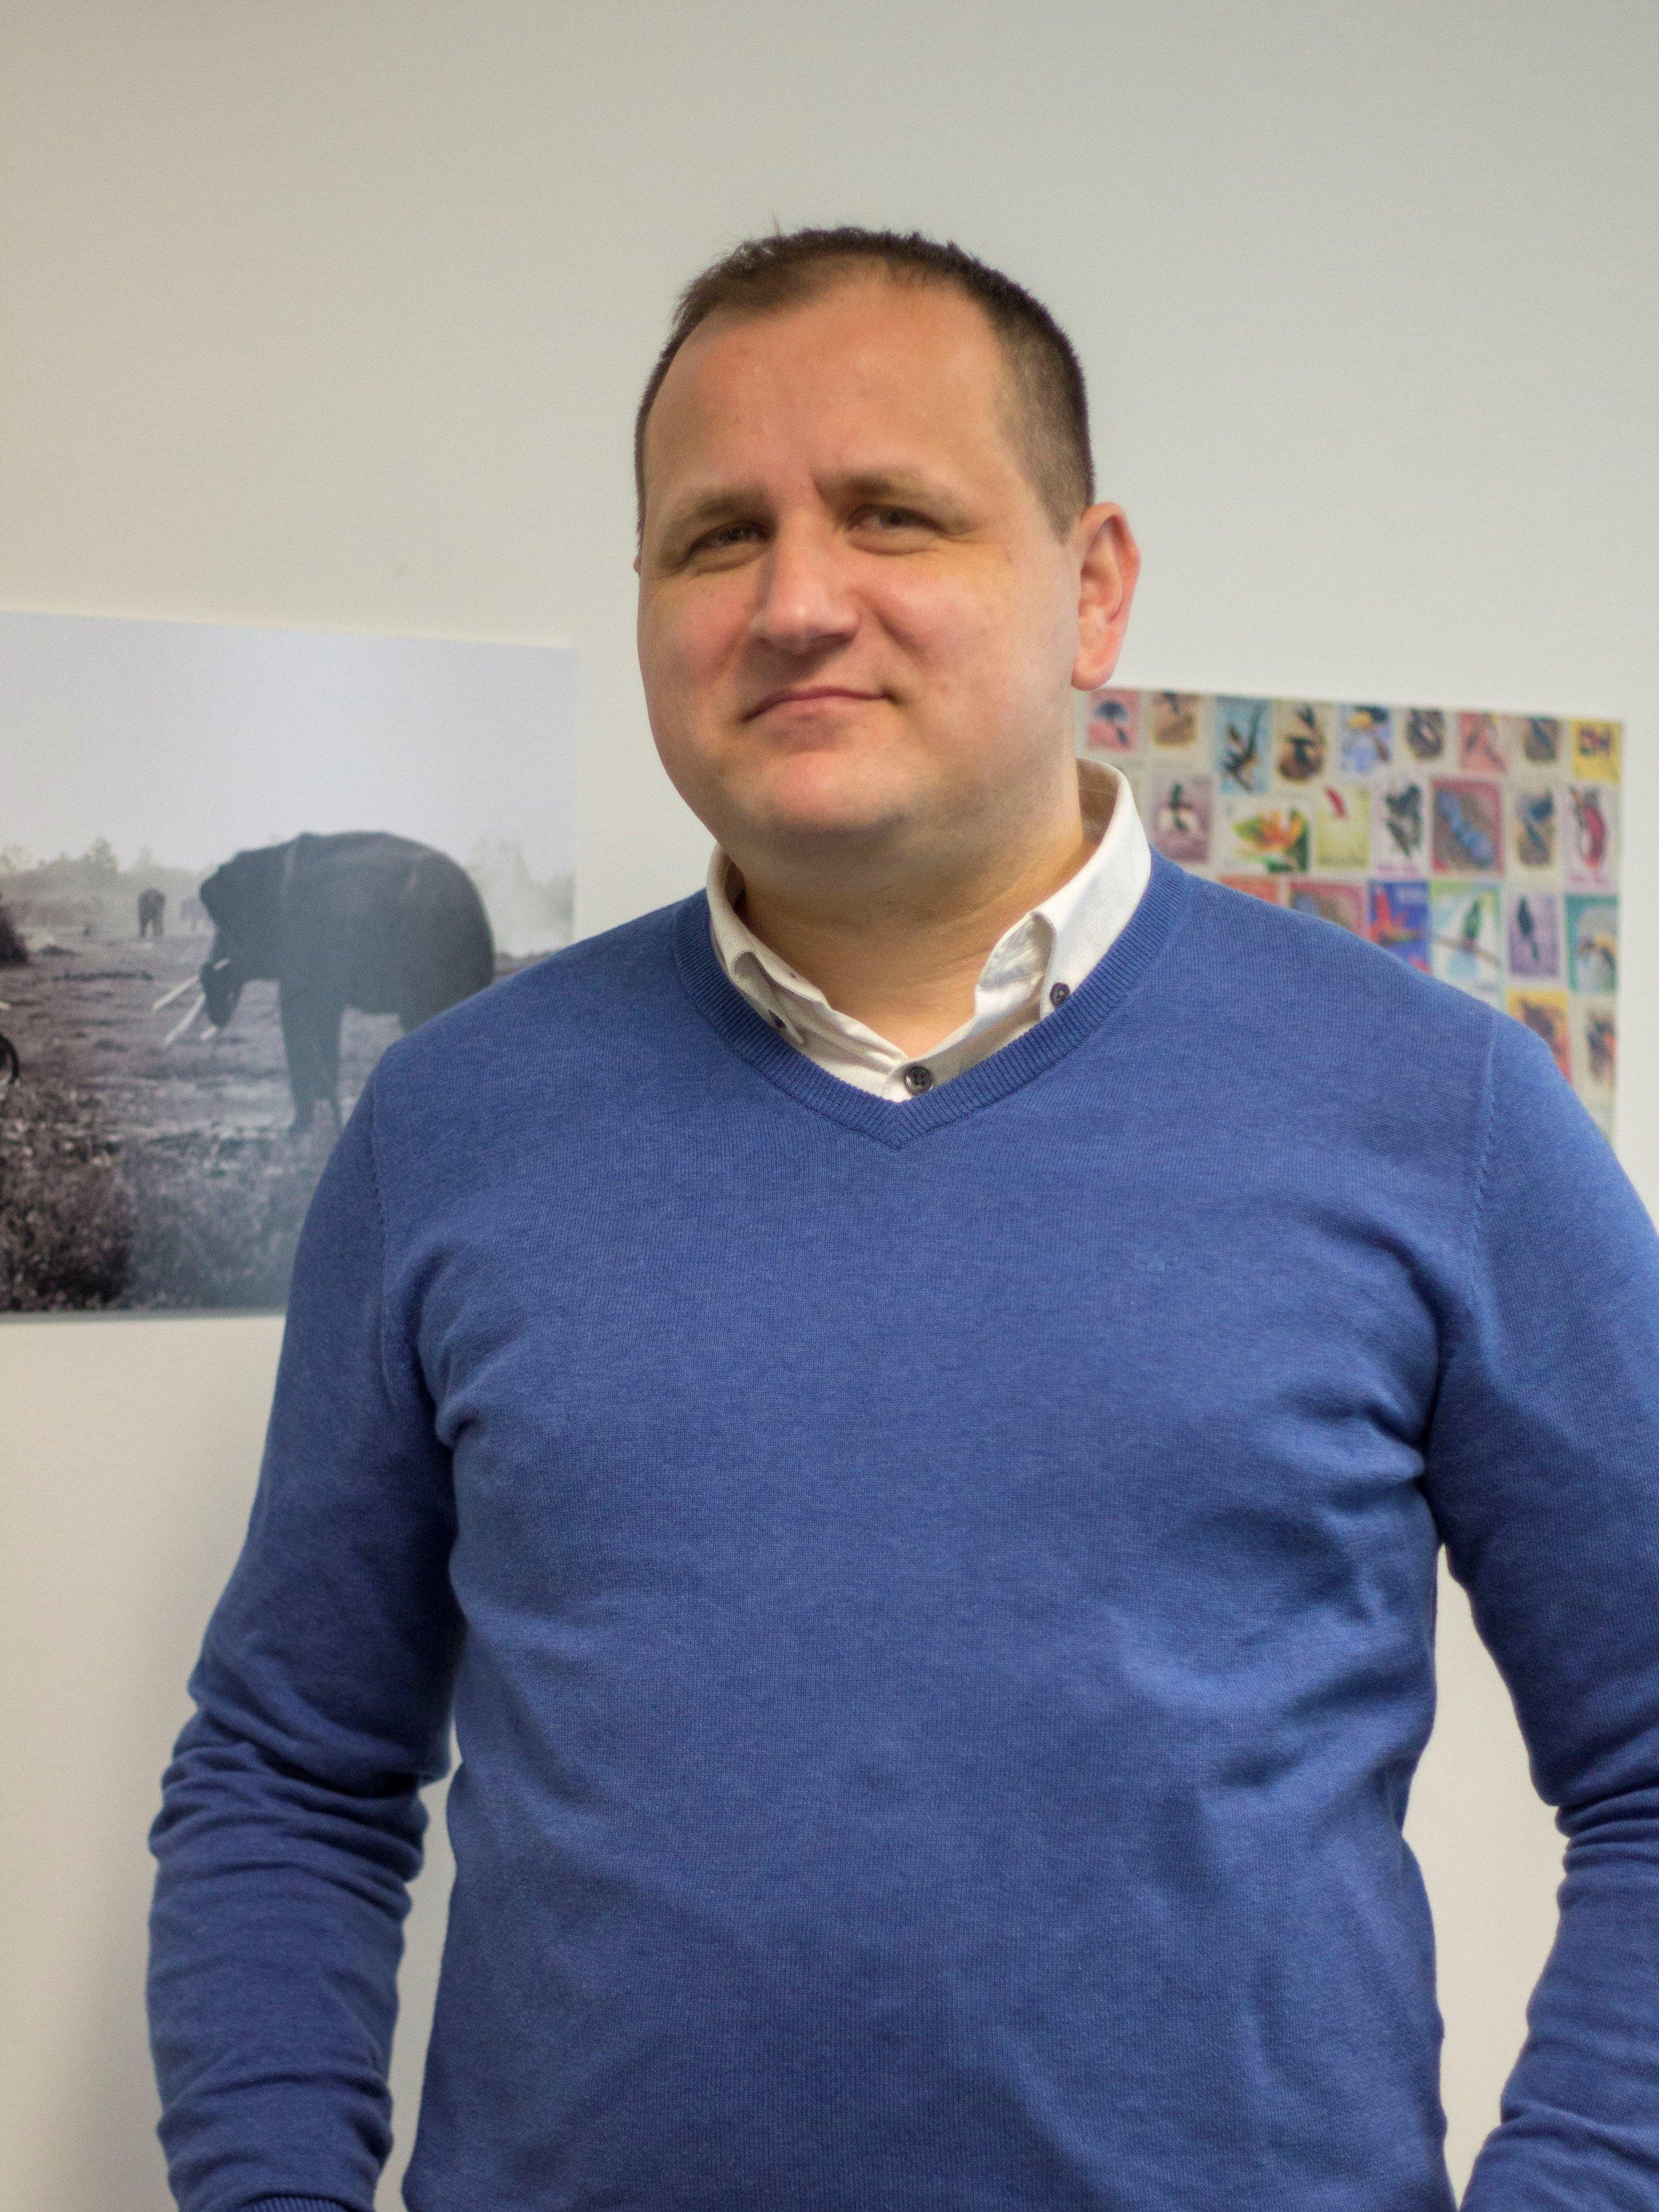 Dr Nermin Oruc - Nationality: BosnianLives in: Sarajevo, Bosnia and Herzegovina